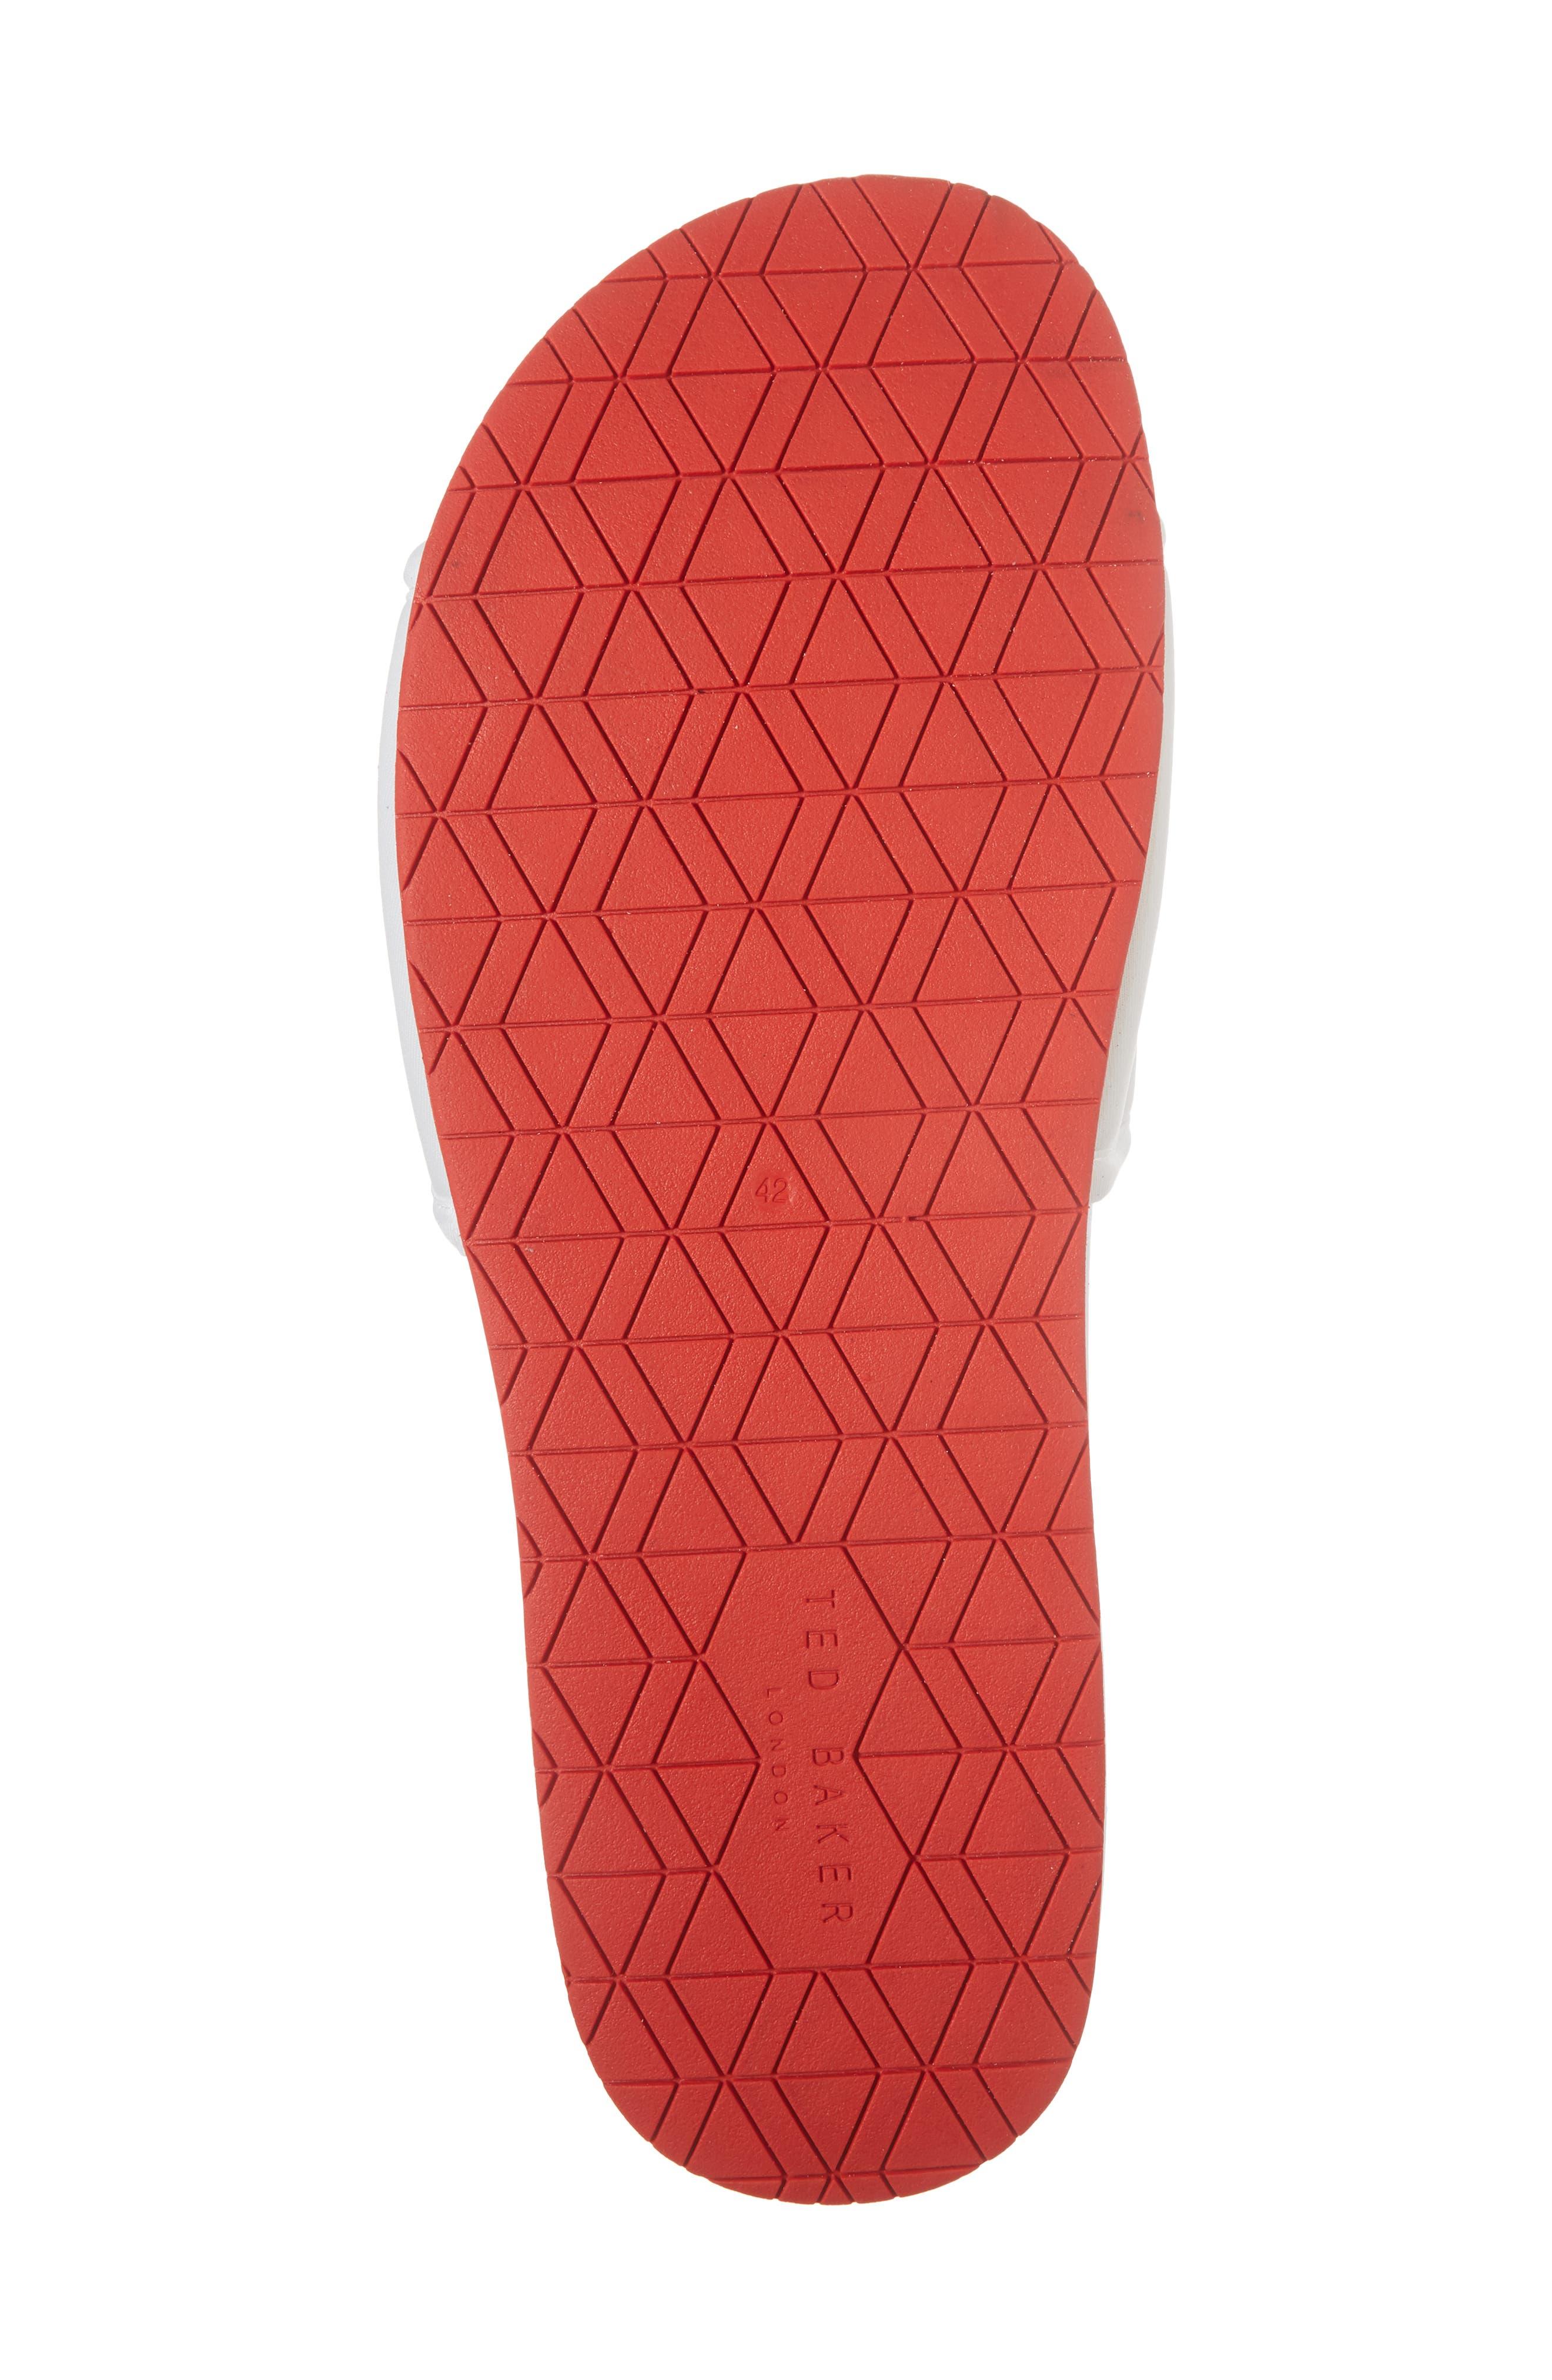 Sauldi 2 Slide Sandal,                             Alternate thumbnail 6, color,                             White/ Red Textile